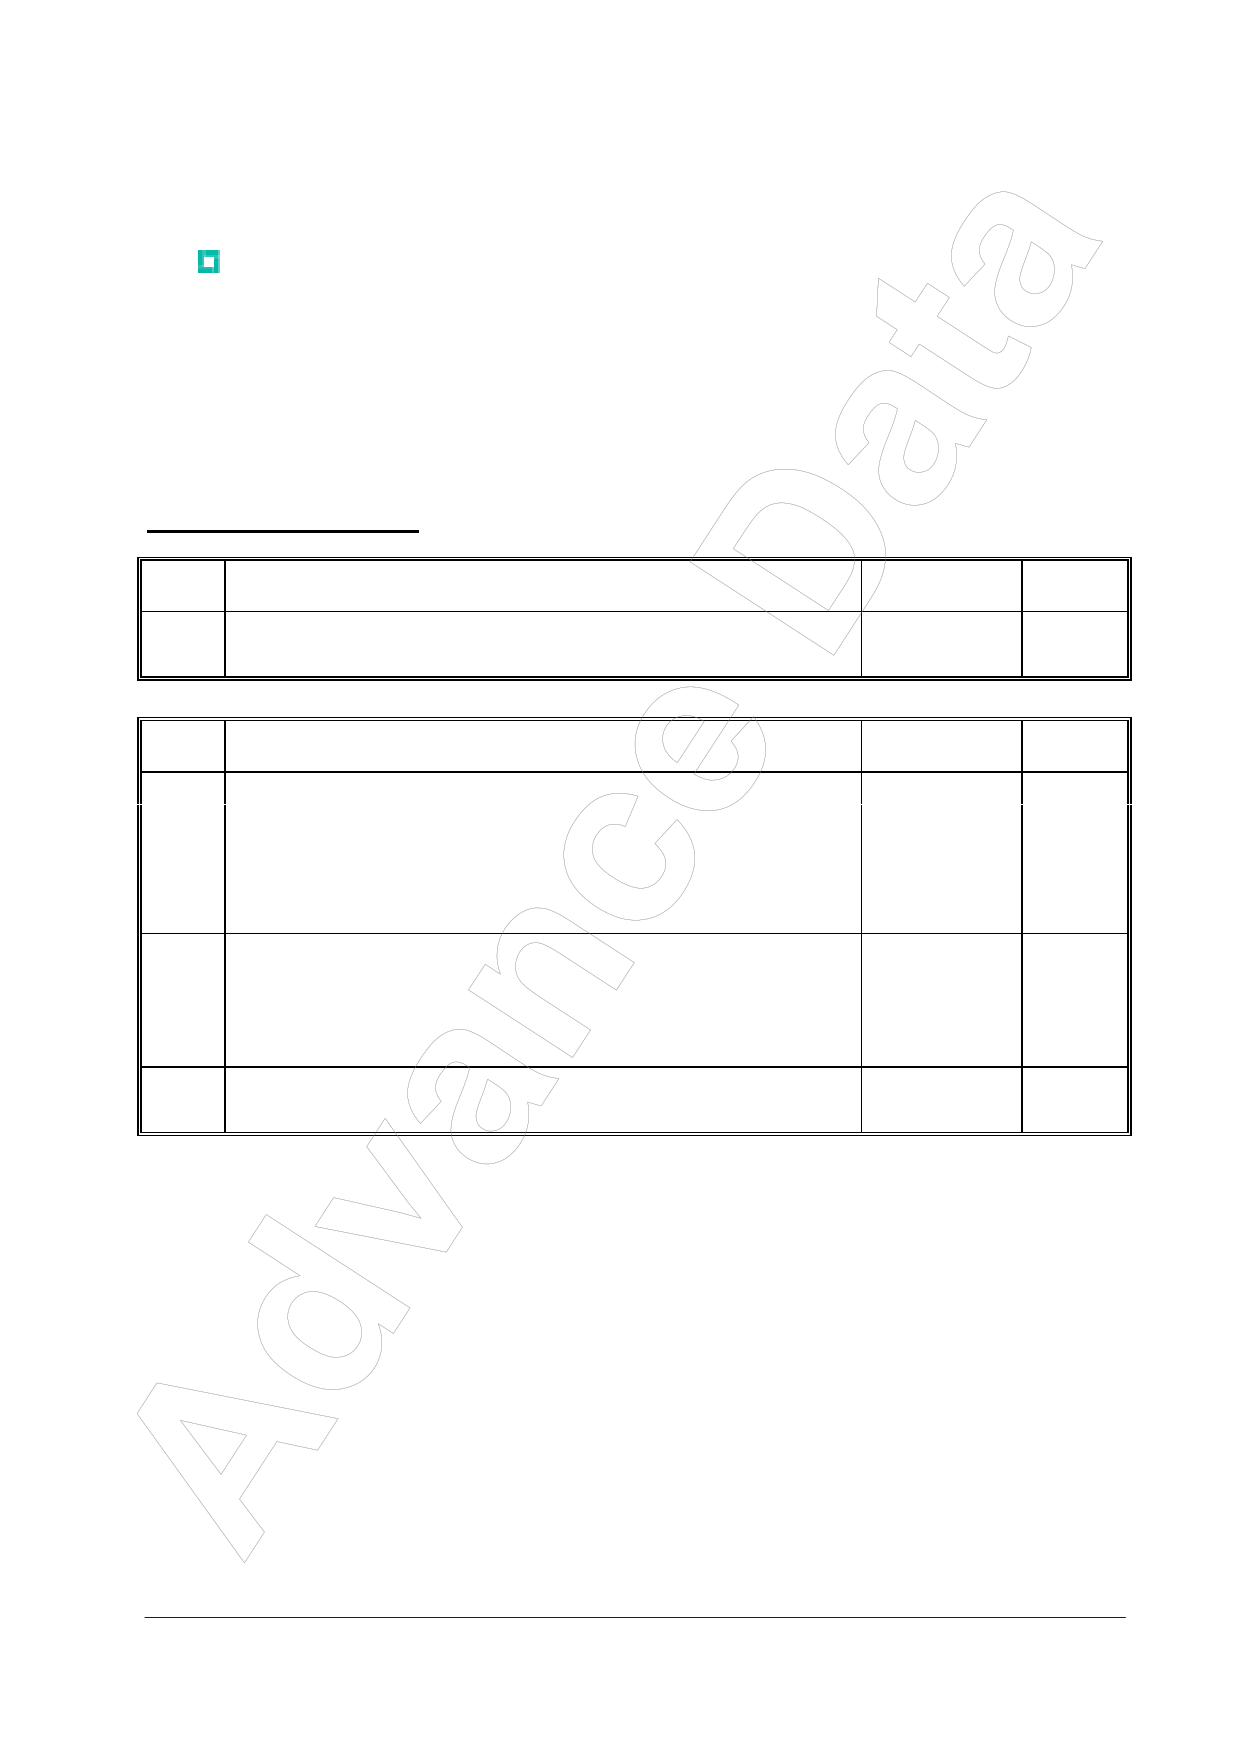 F0300WC180 datasheet